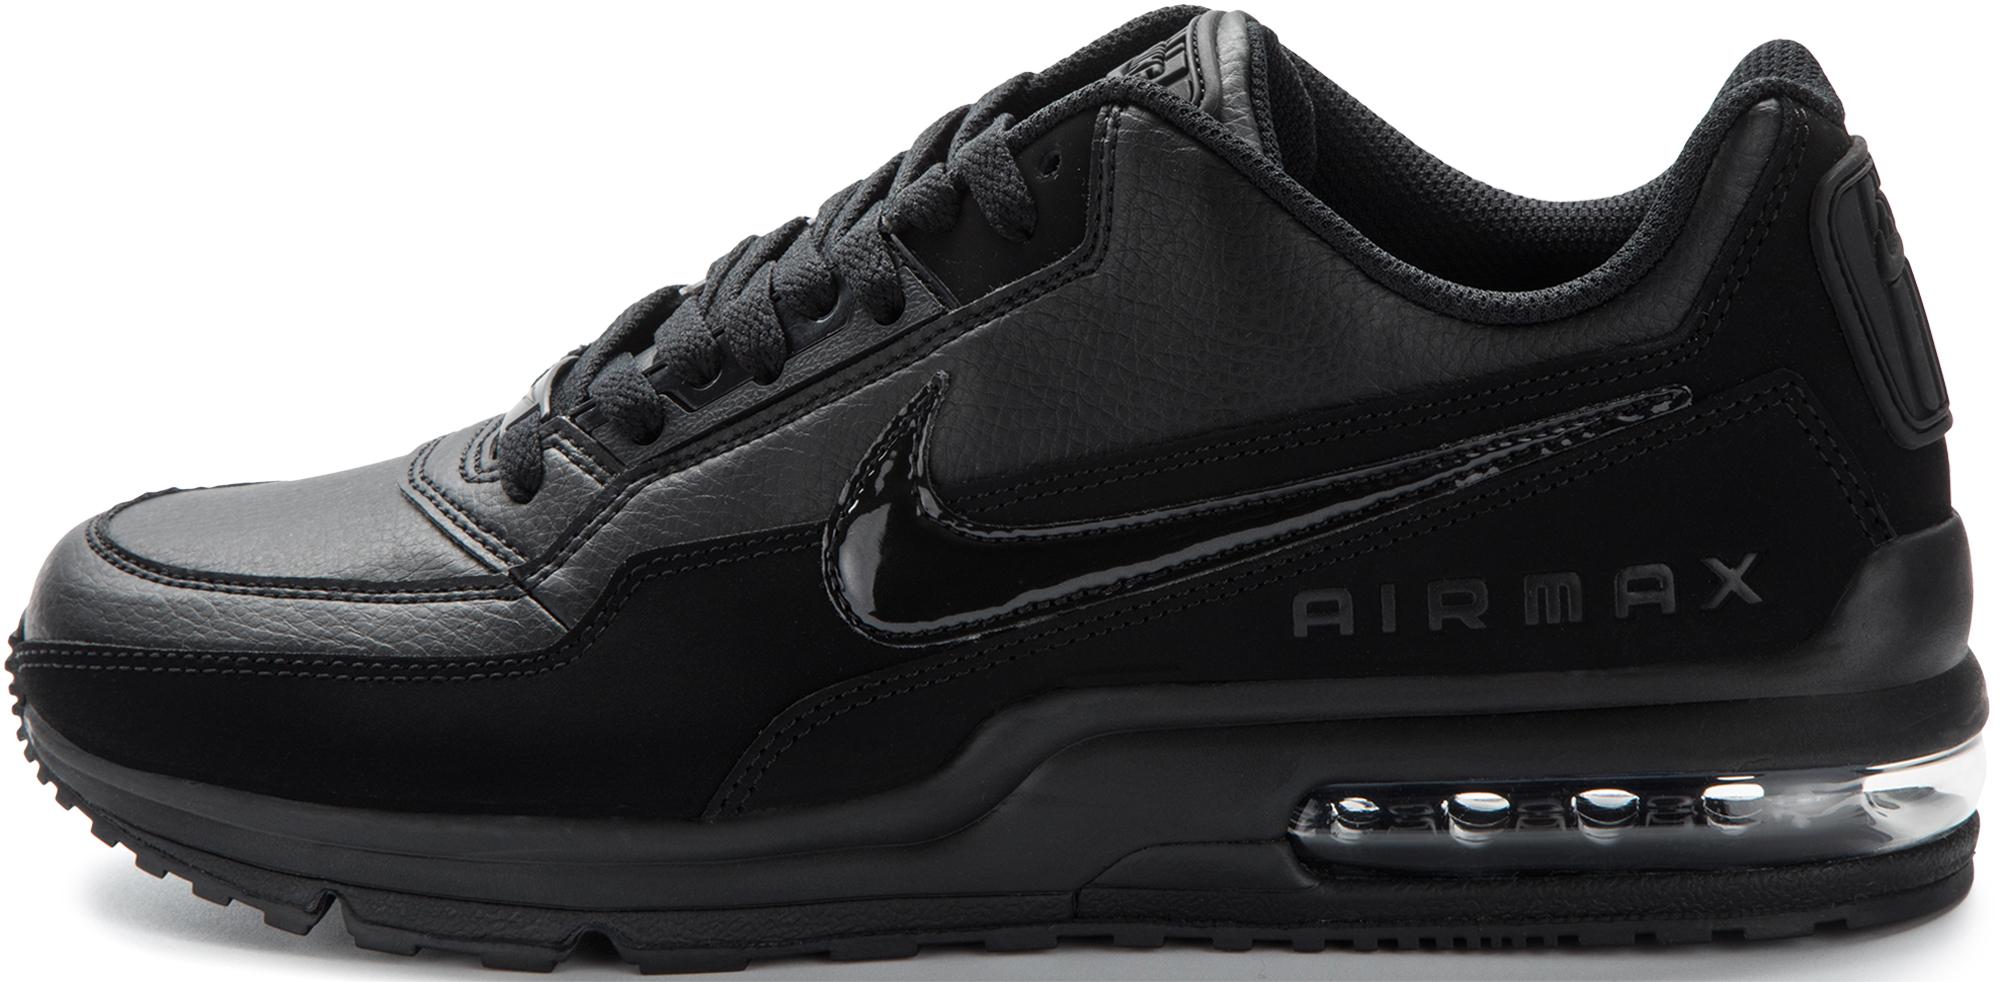 Nike Кроссовки мужские Nike Air Max LTD 3, размер 43,5 цена